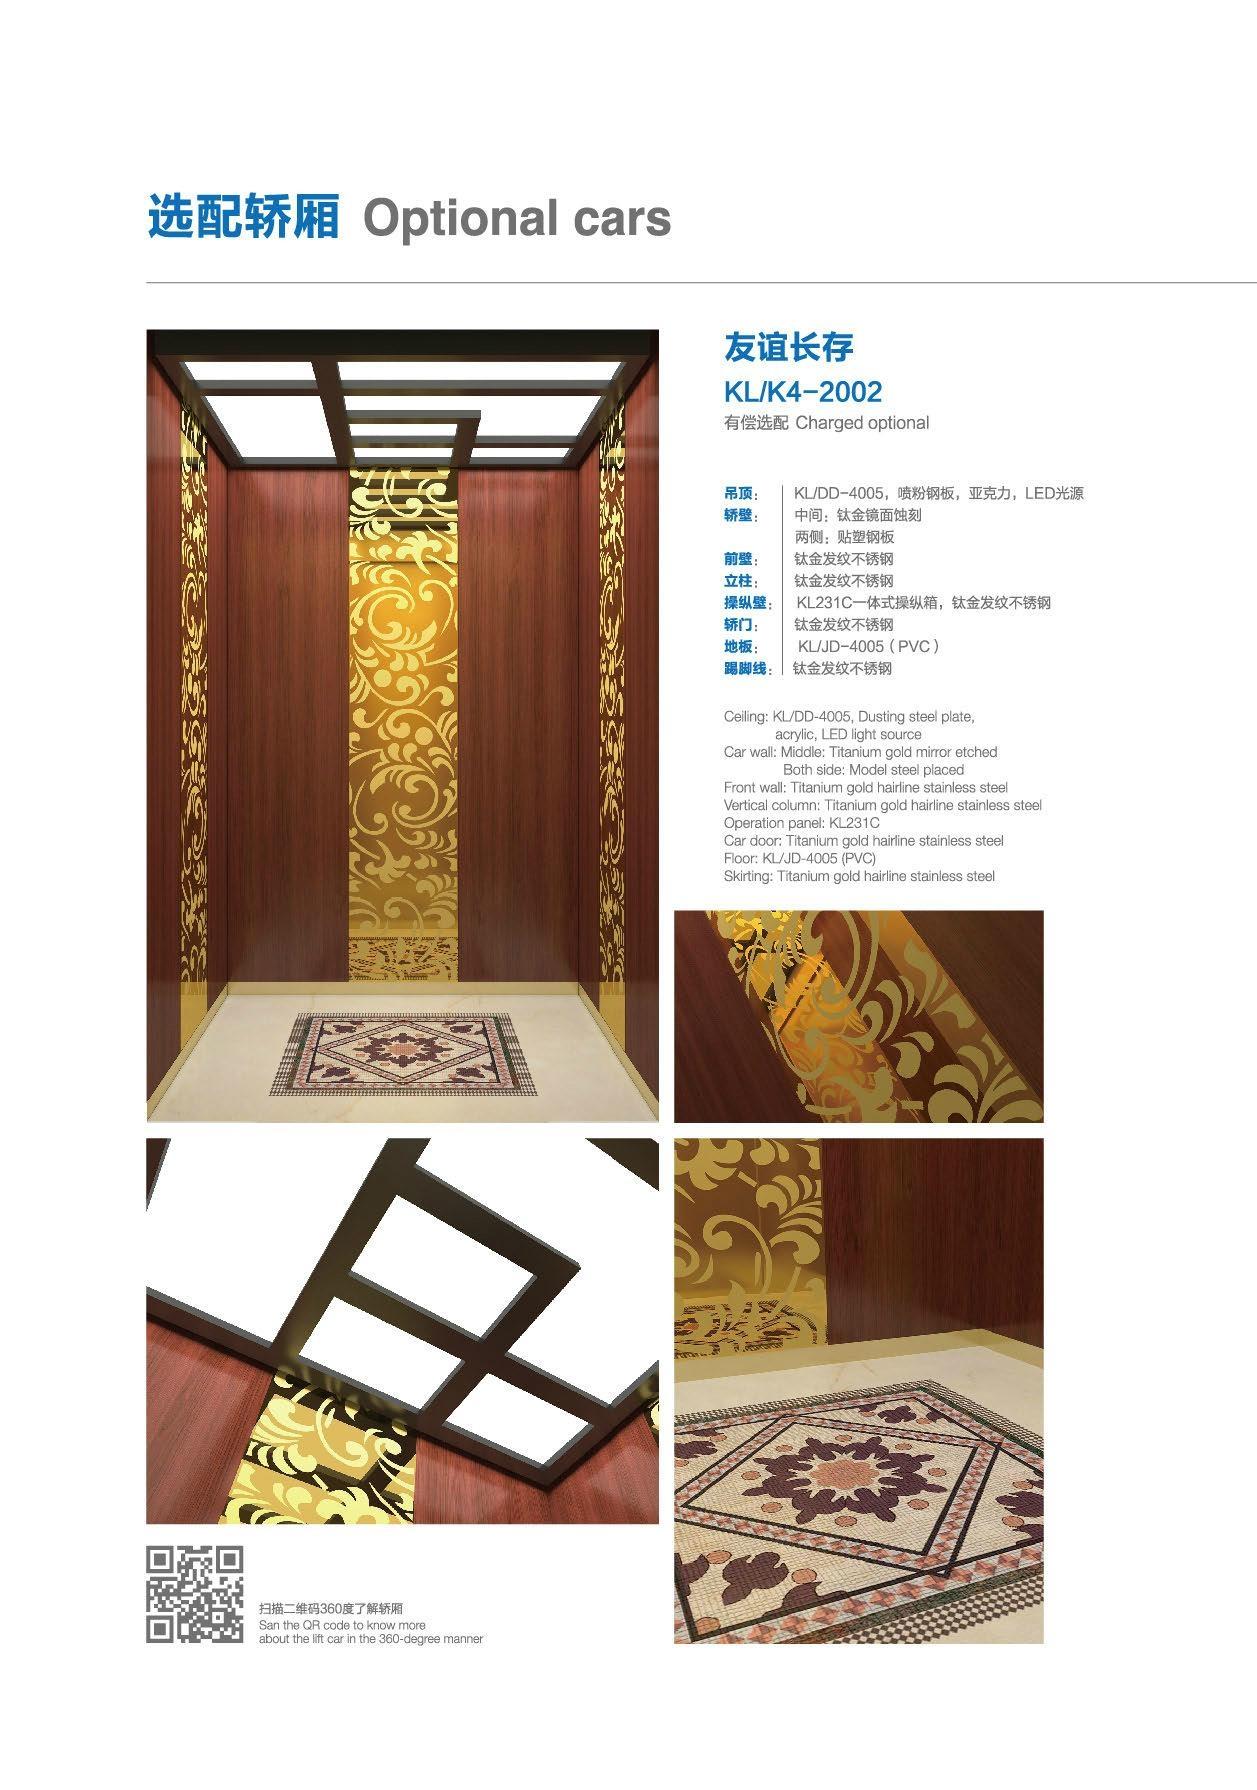 Machine Roomless Passenger Elevator 3